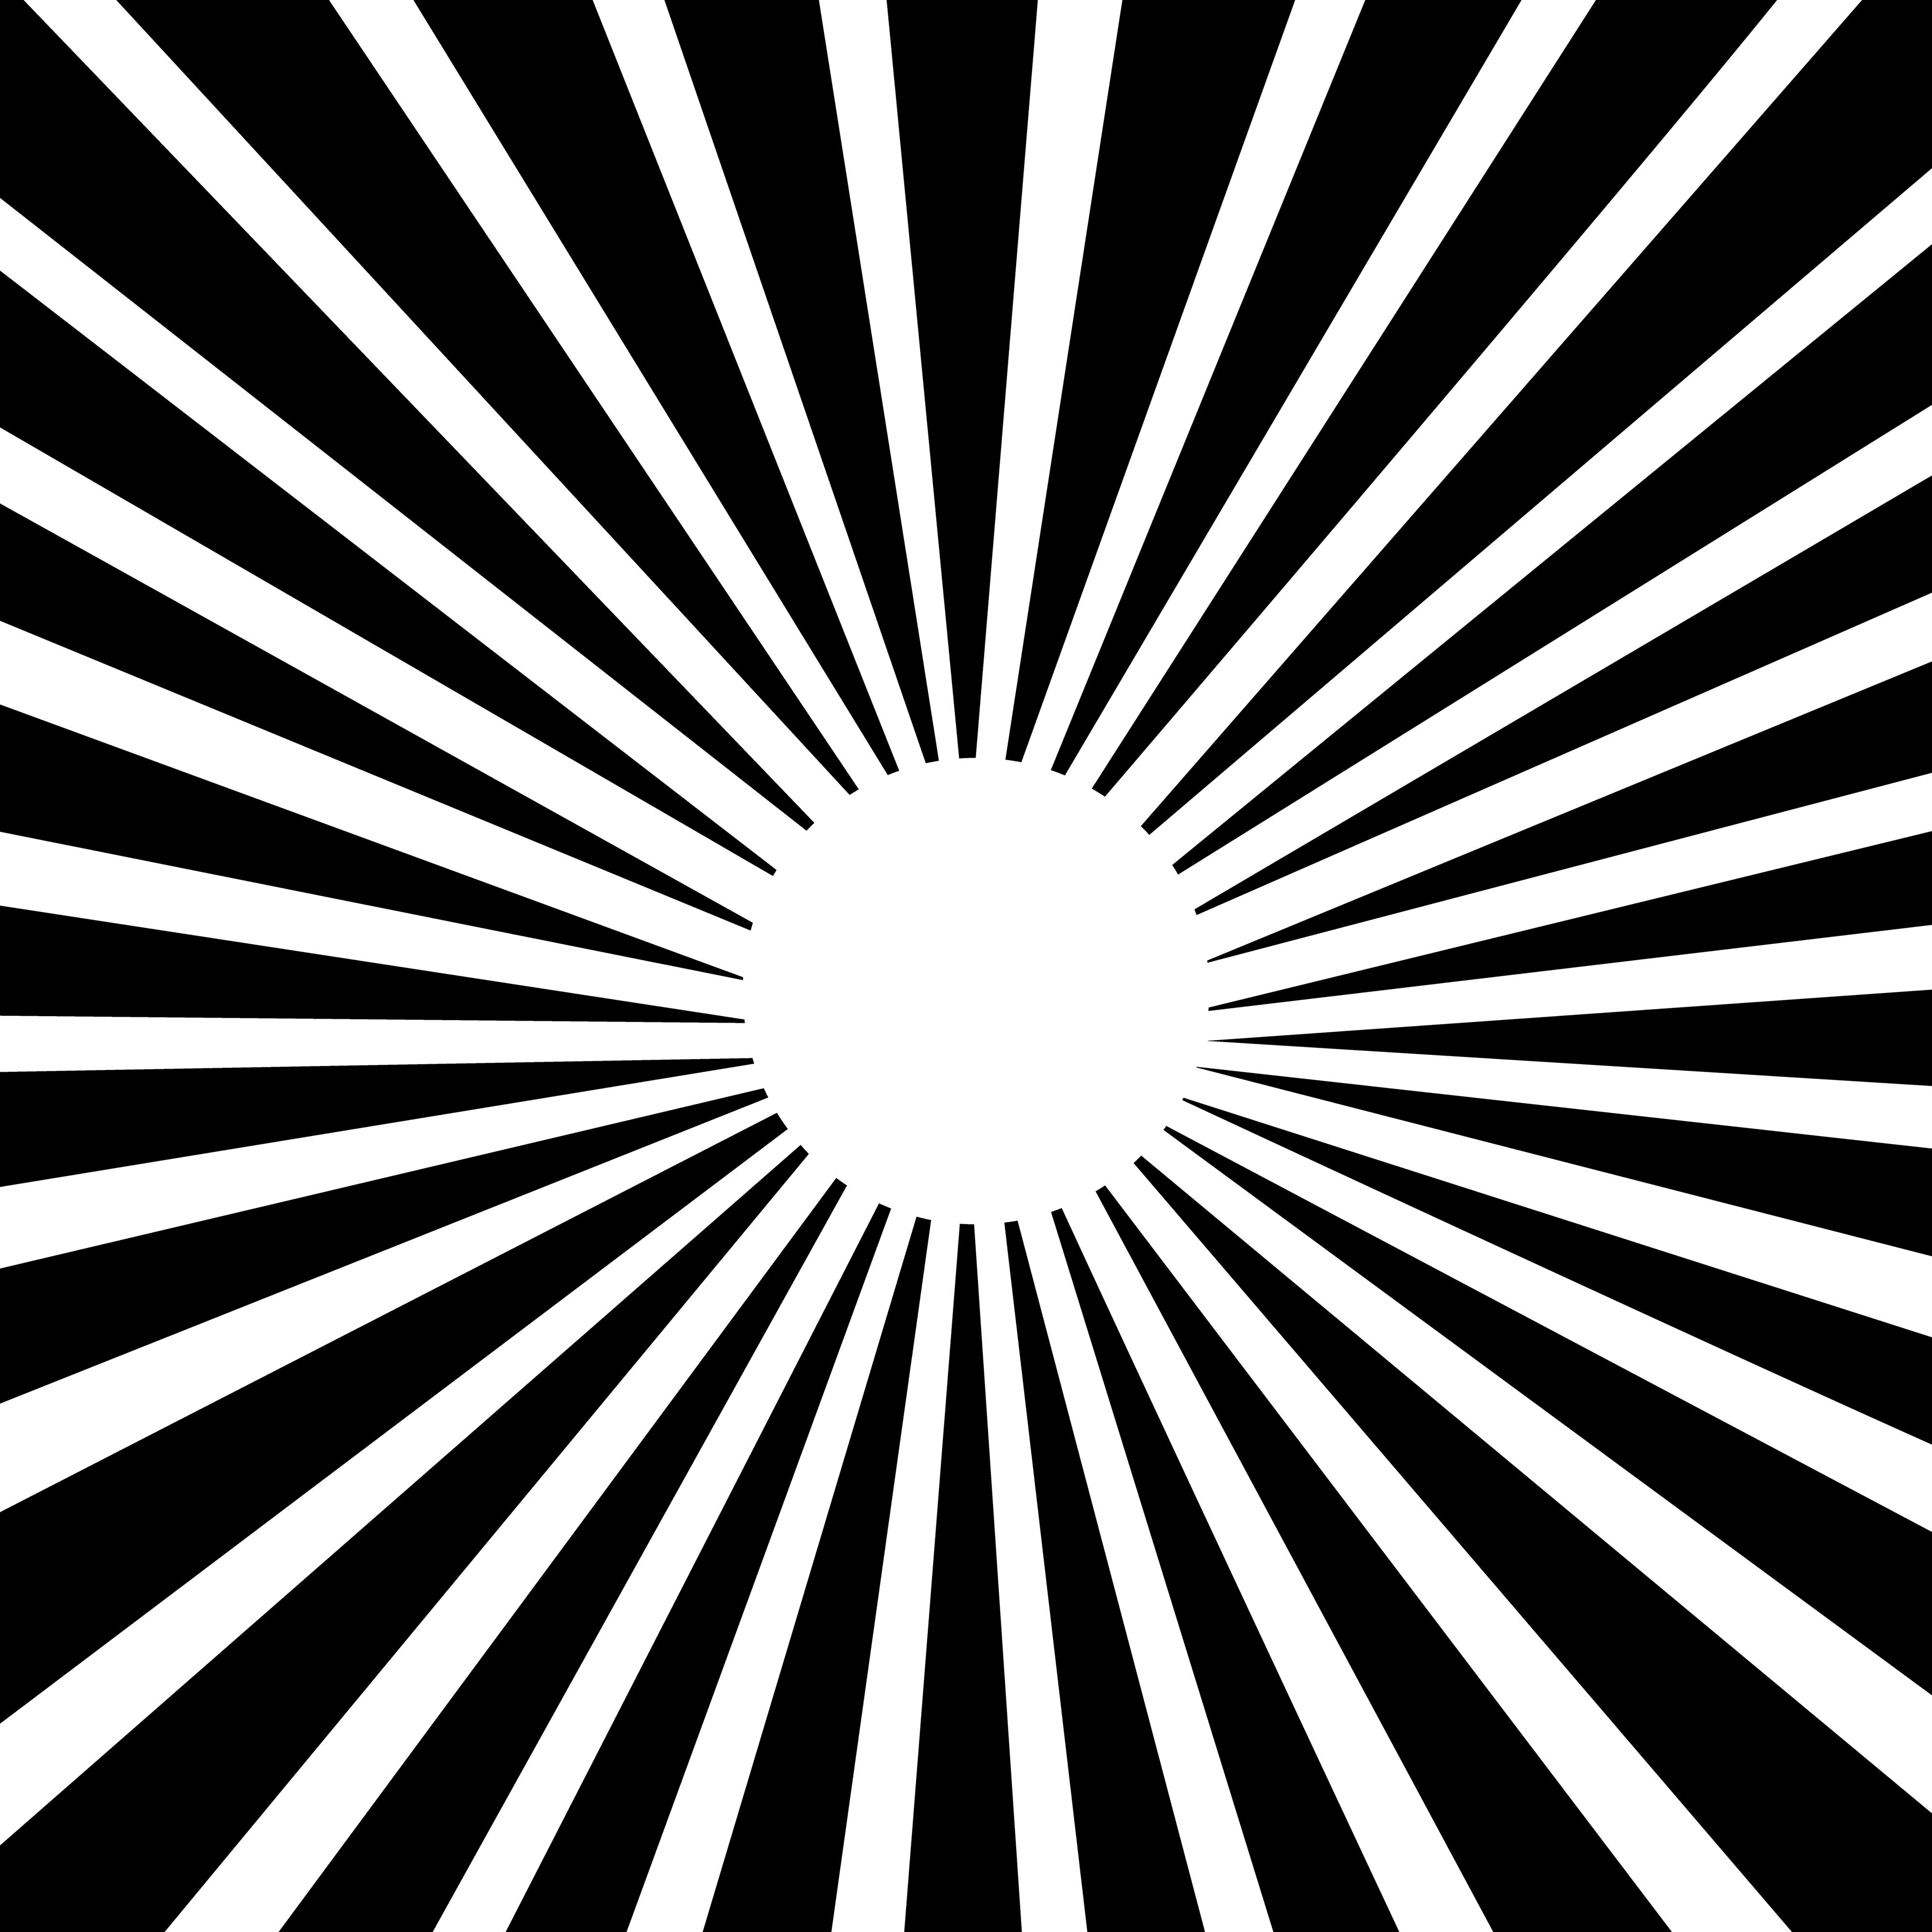 Pattern clipart burst And Black Burst Intense Free